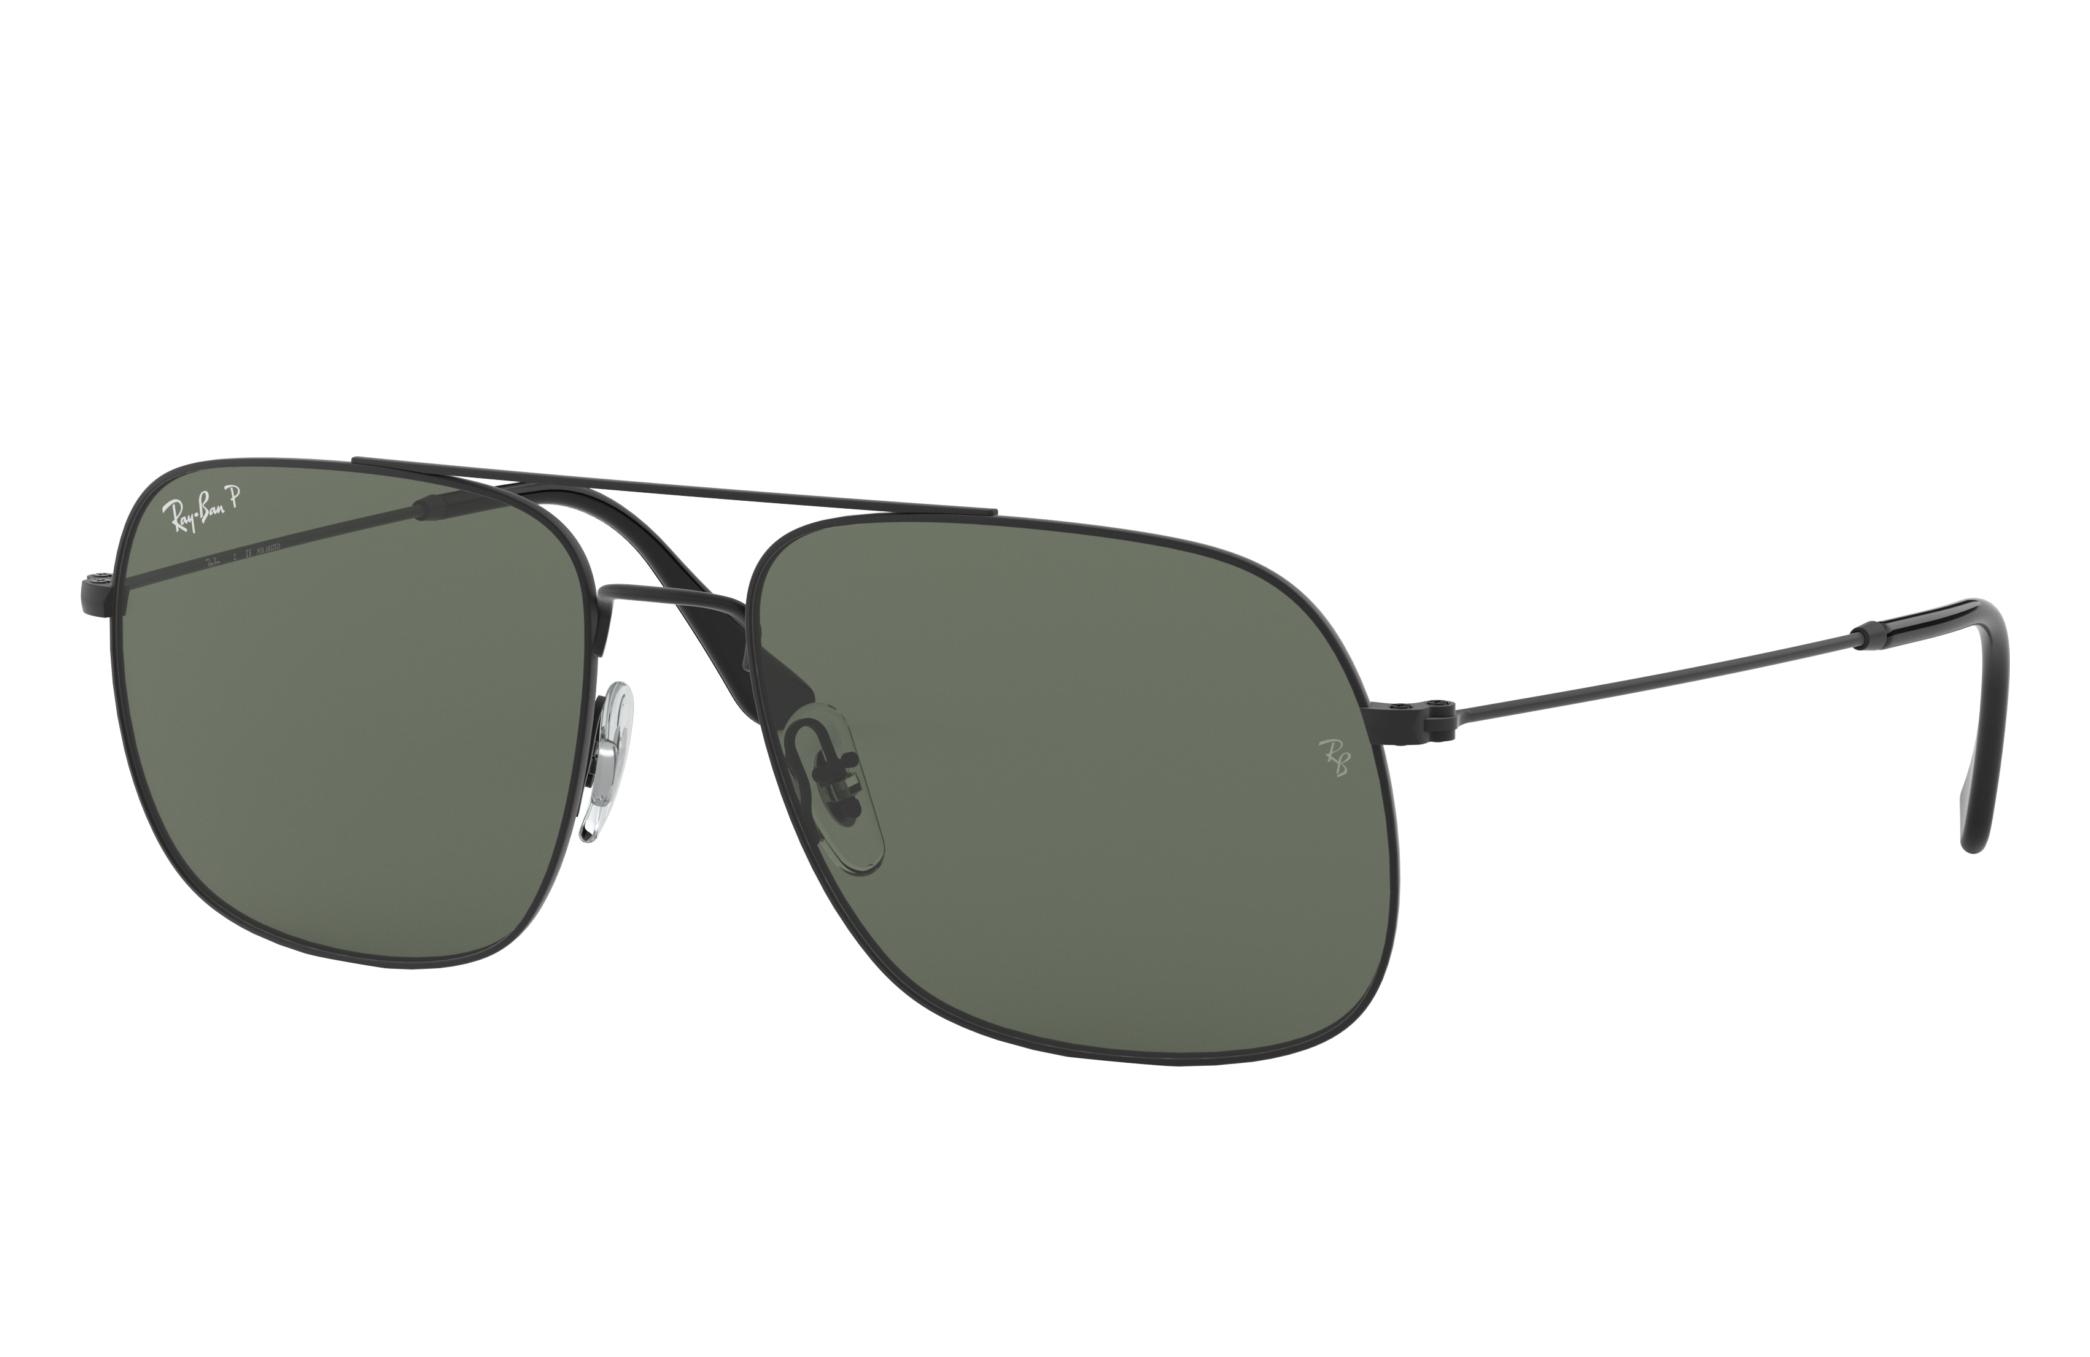 Ray-Ban Rb3595 Black, Polarized Green Lenses - RB3595